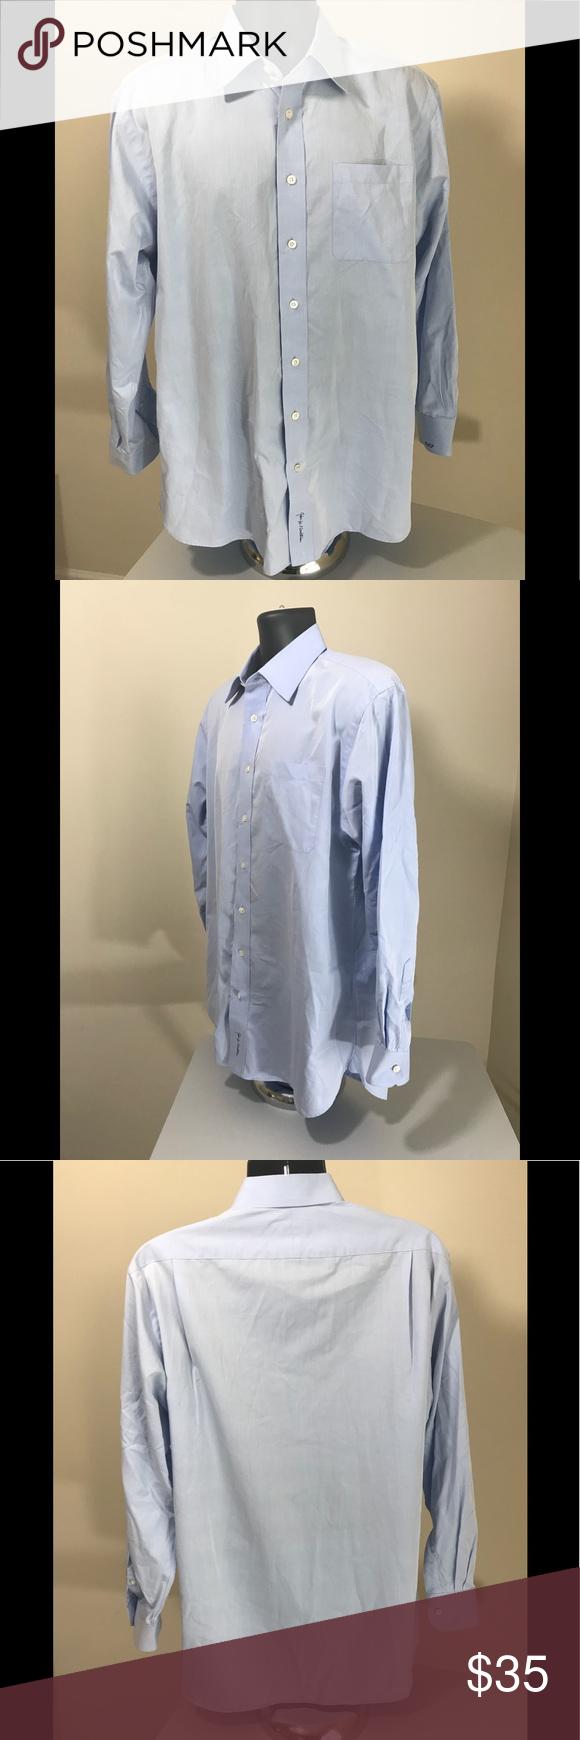 John W Nordstrom Dress Shirt In 2018 My Posh Closet Pinterest